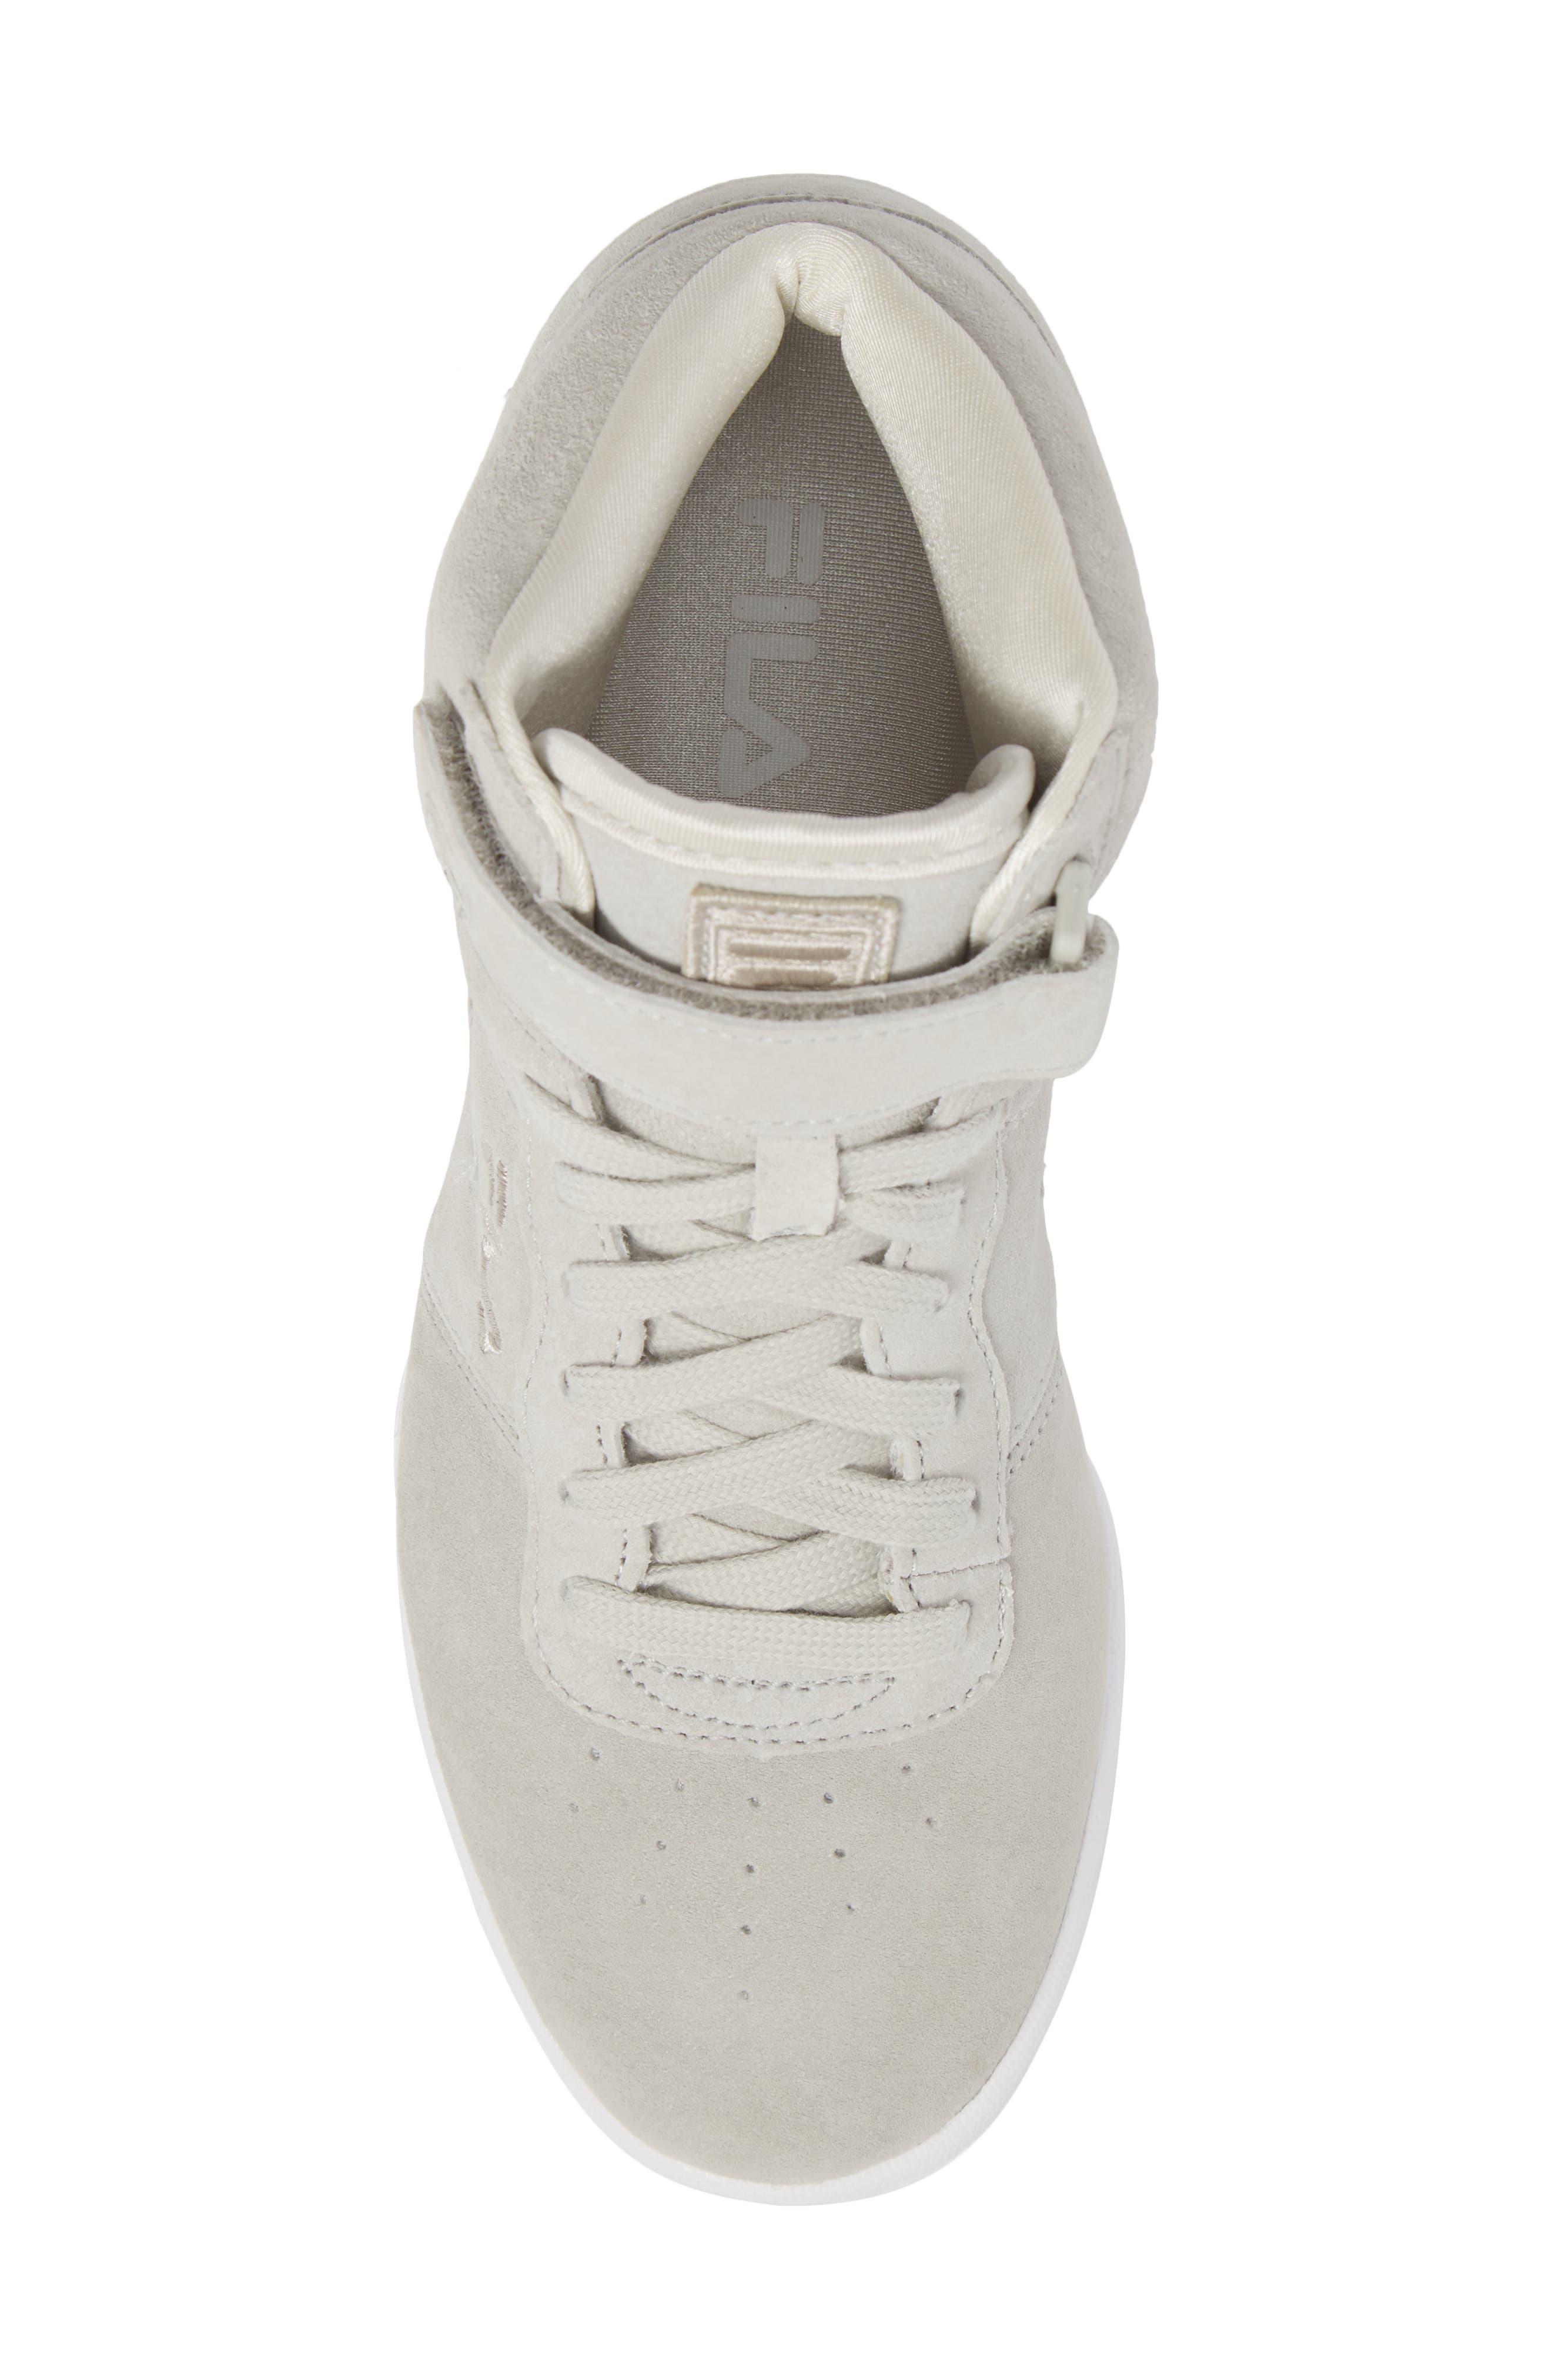 F-13 Premium Mid Top Sneaker,                             Alternate thumbnail 5, color,                             White